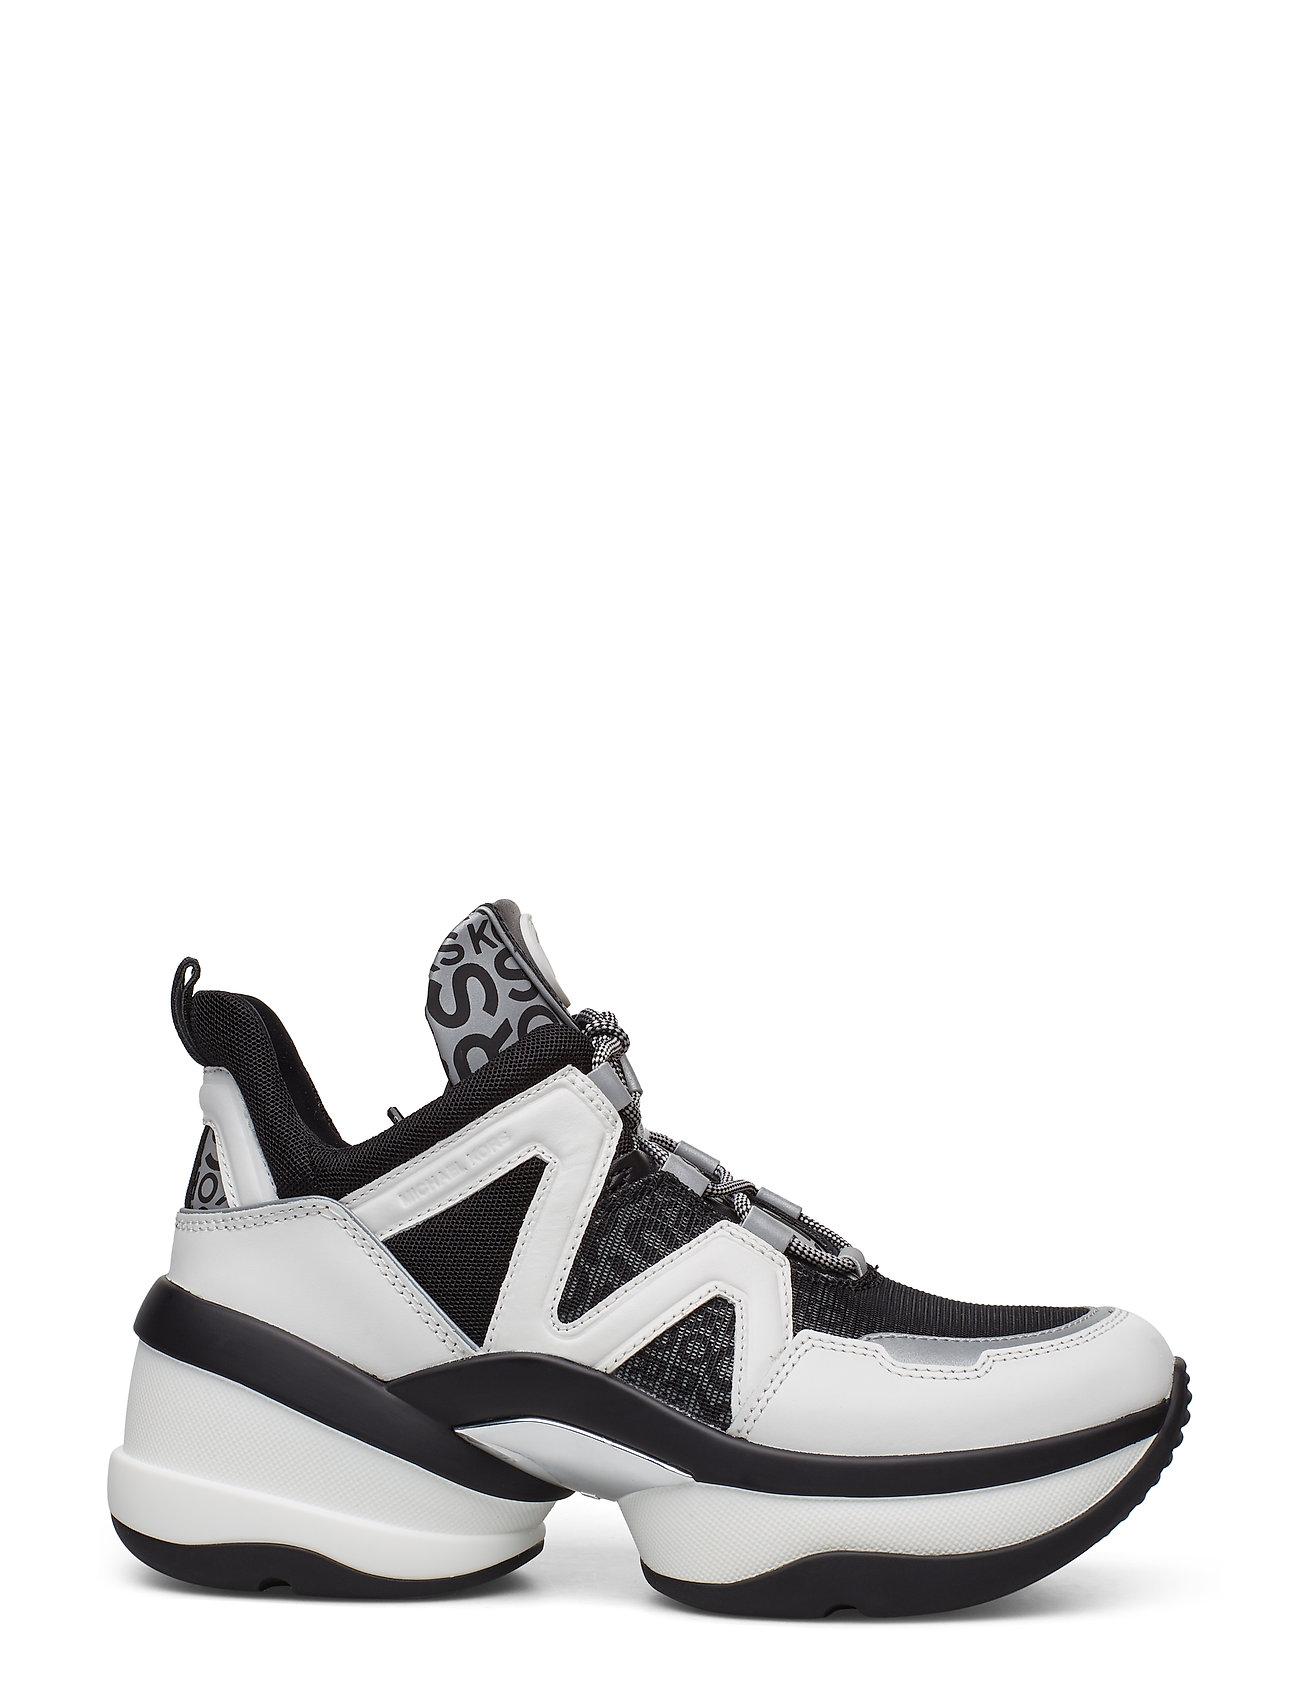 Olympia Shoes MultiMichael Traineropwht Kors 3AL5Rj4q